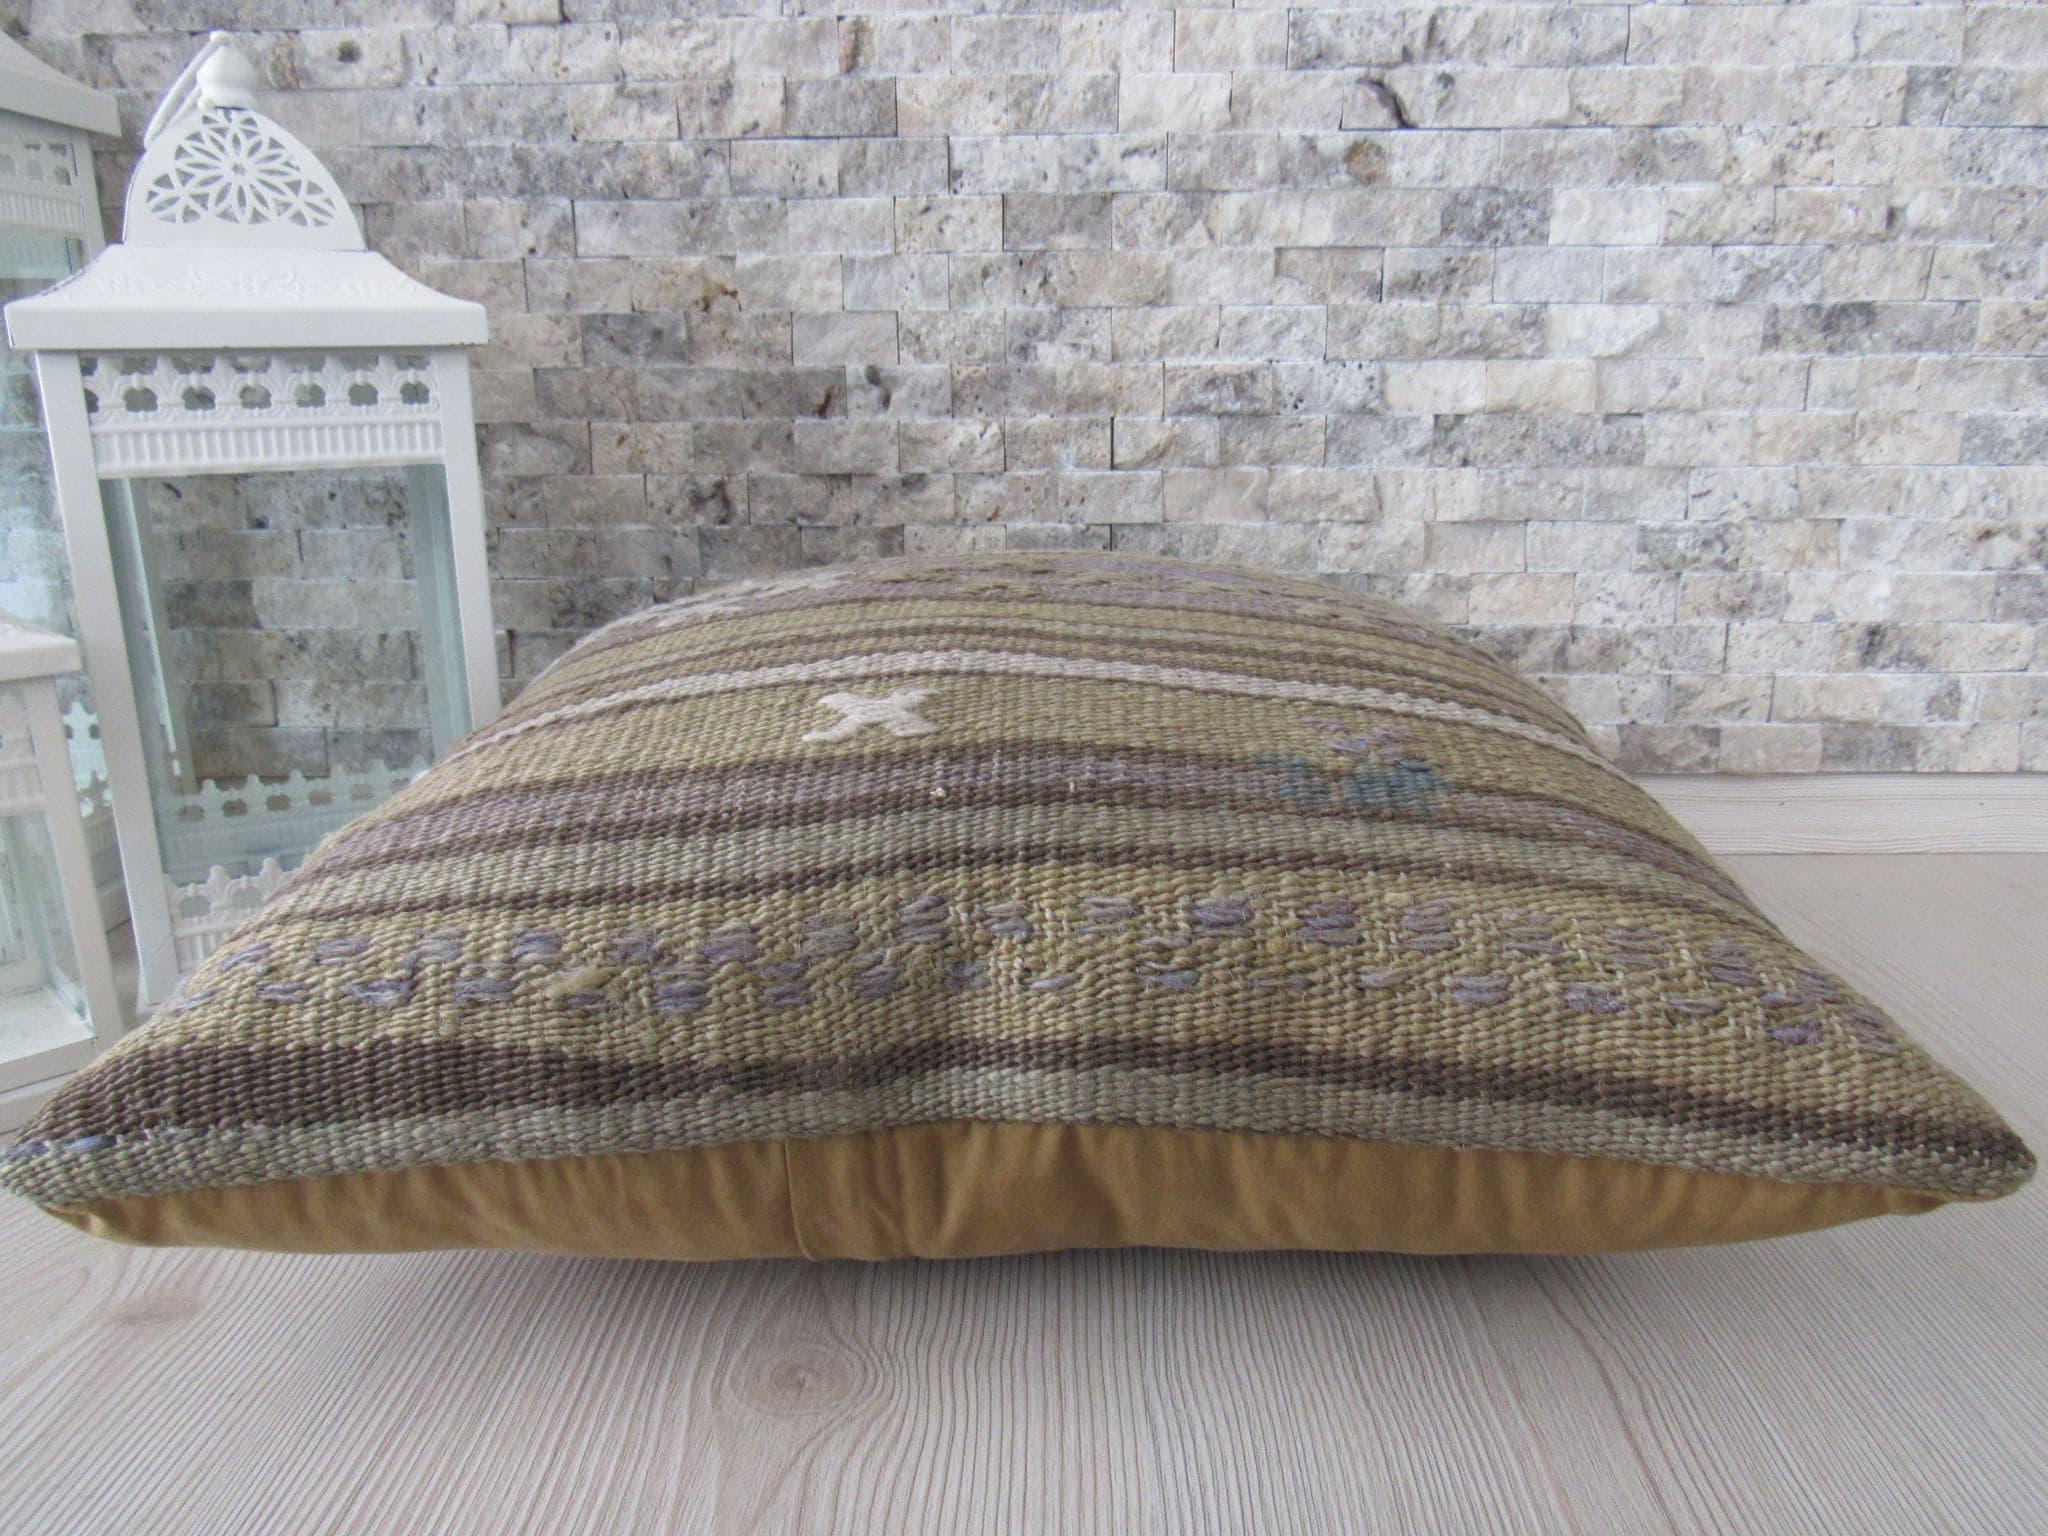 Vintage Kilim Pillow Cover 18x18 Decorative Boho Pillow Sofa Pillow Aztec  Pillow Rustic Pillow Asian Pillow